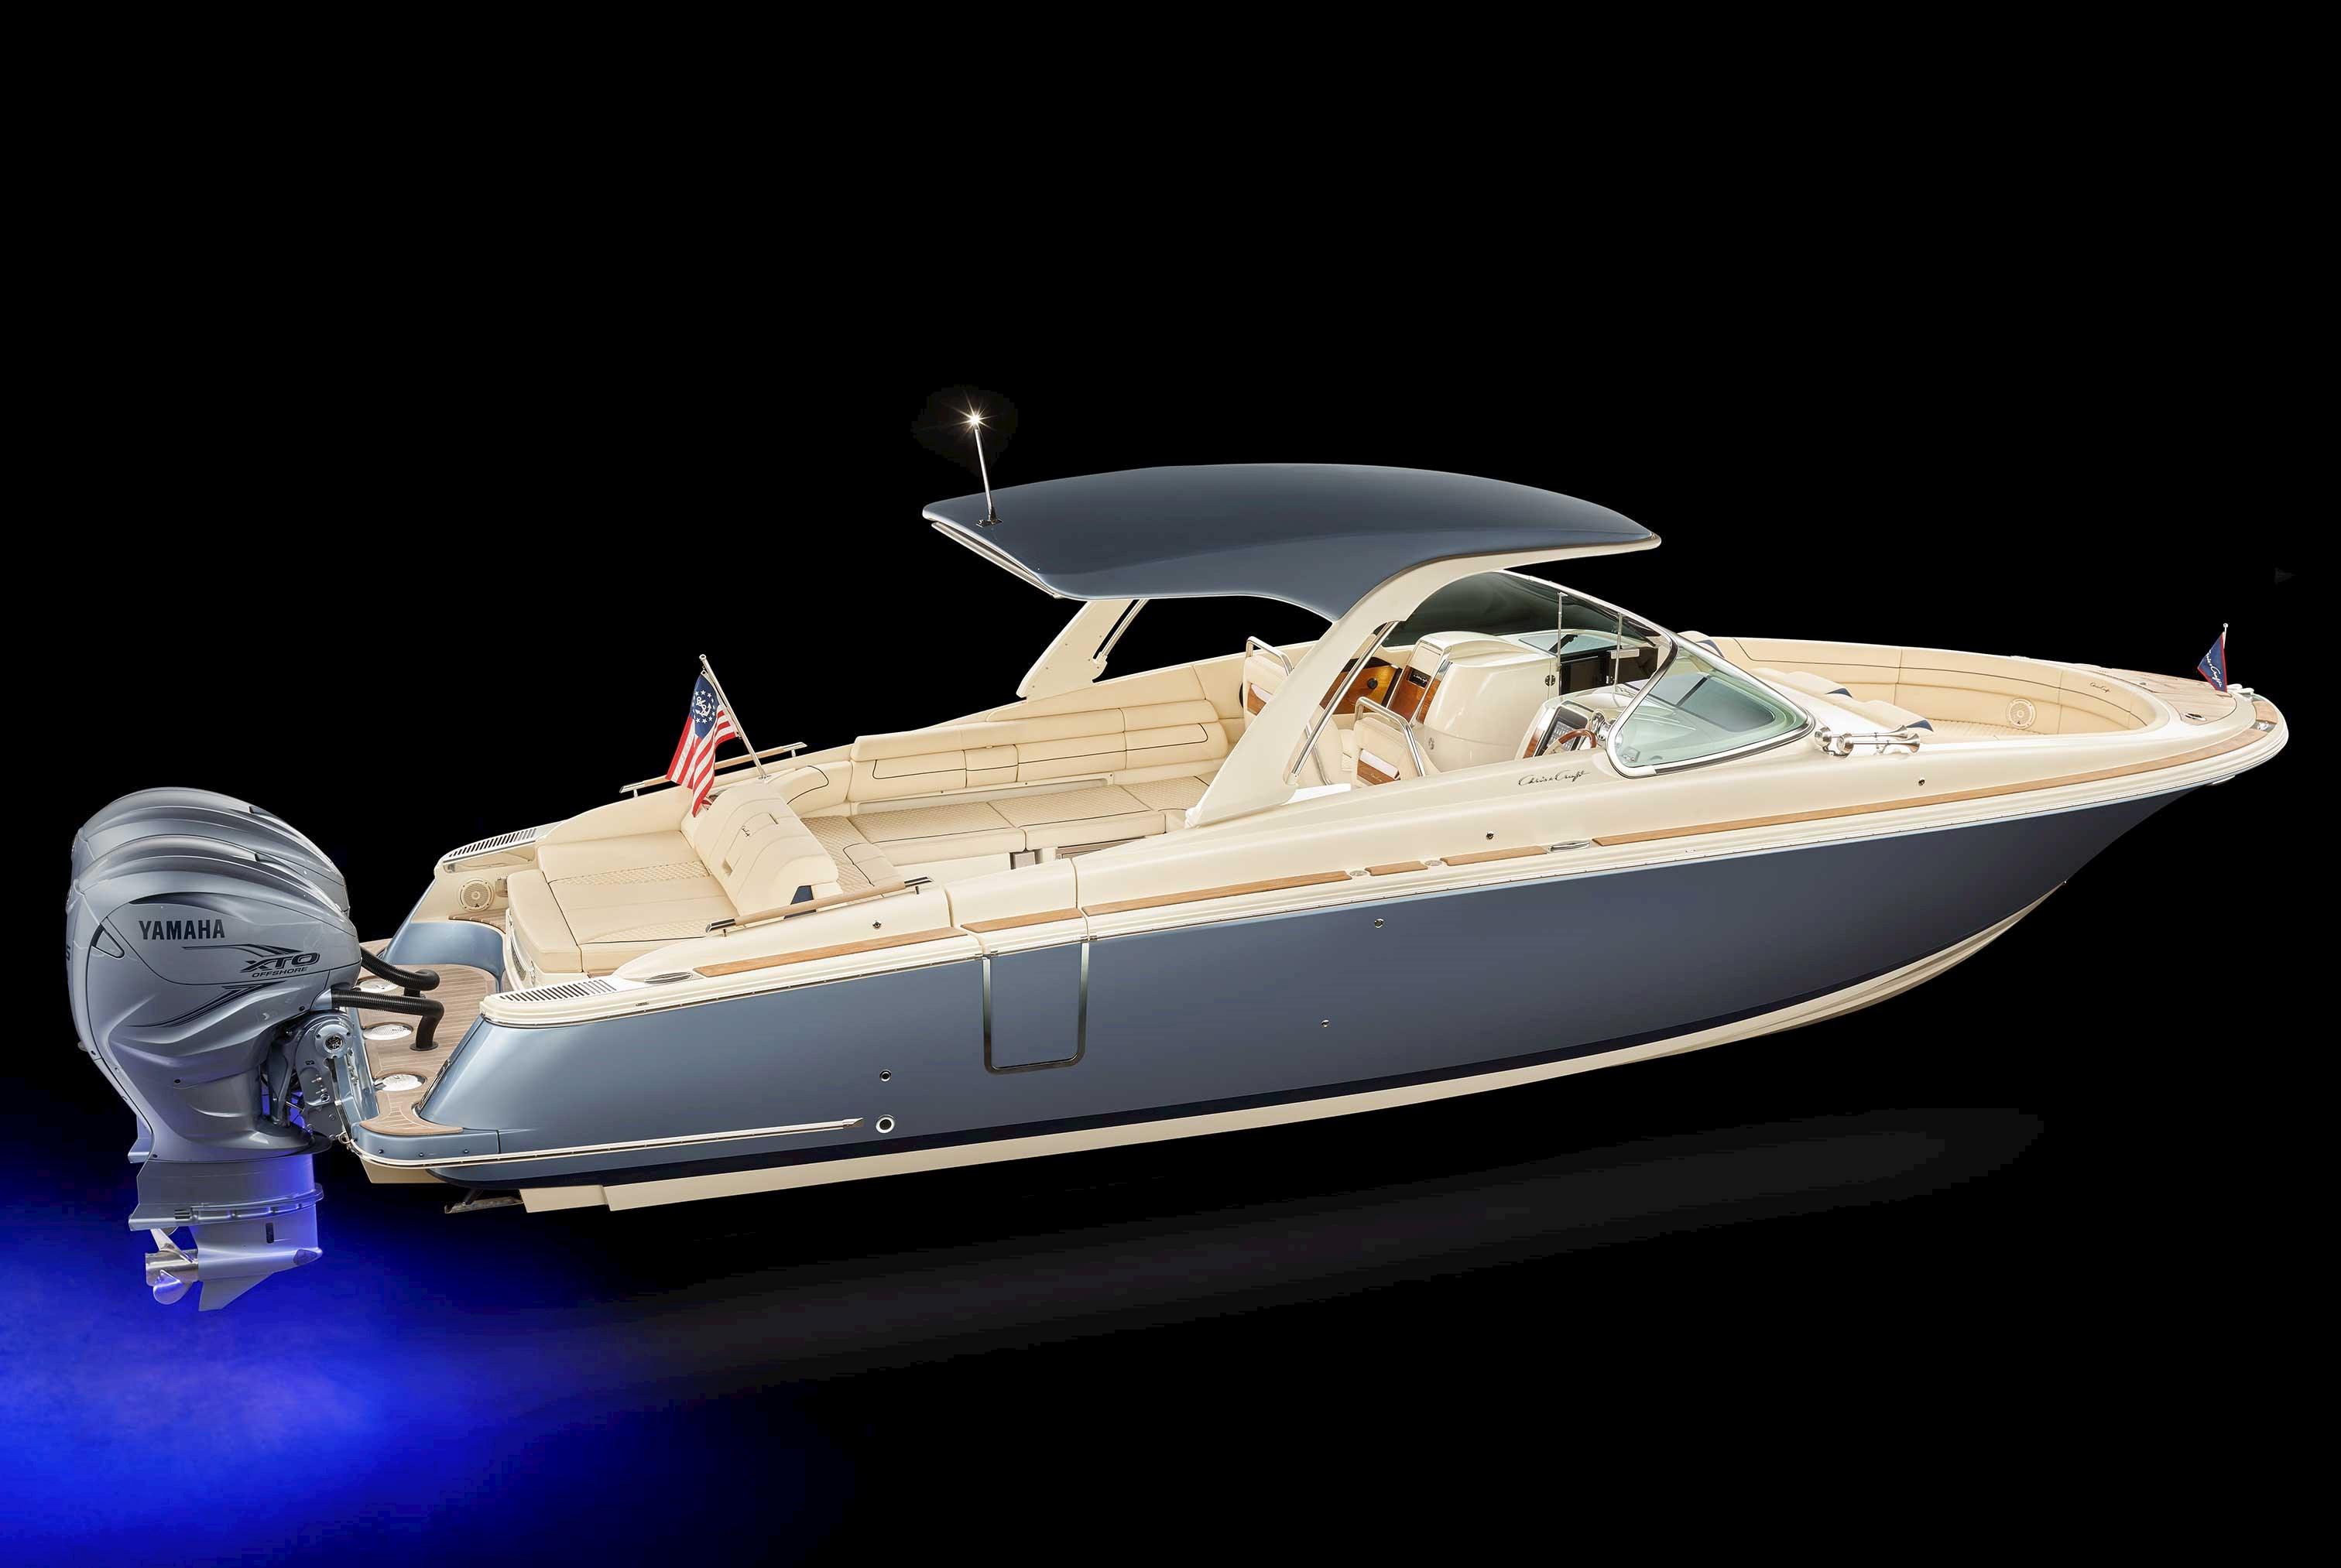 launch 35 gt, ski boat, open bow boat, bowrider boat